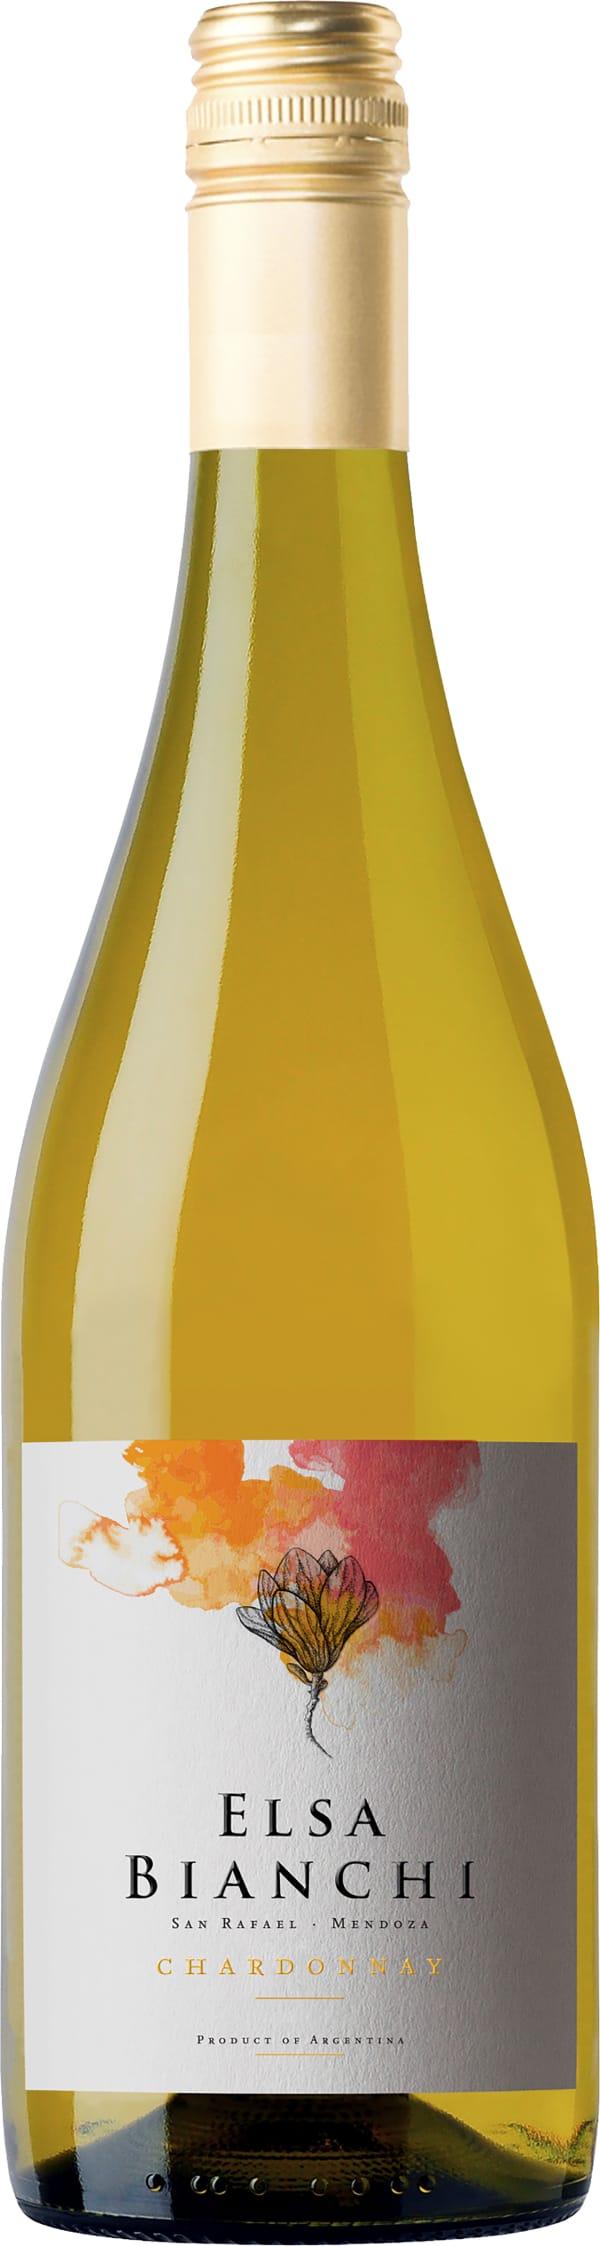 Elsa Bianchi Chardonnay 2014